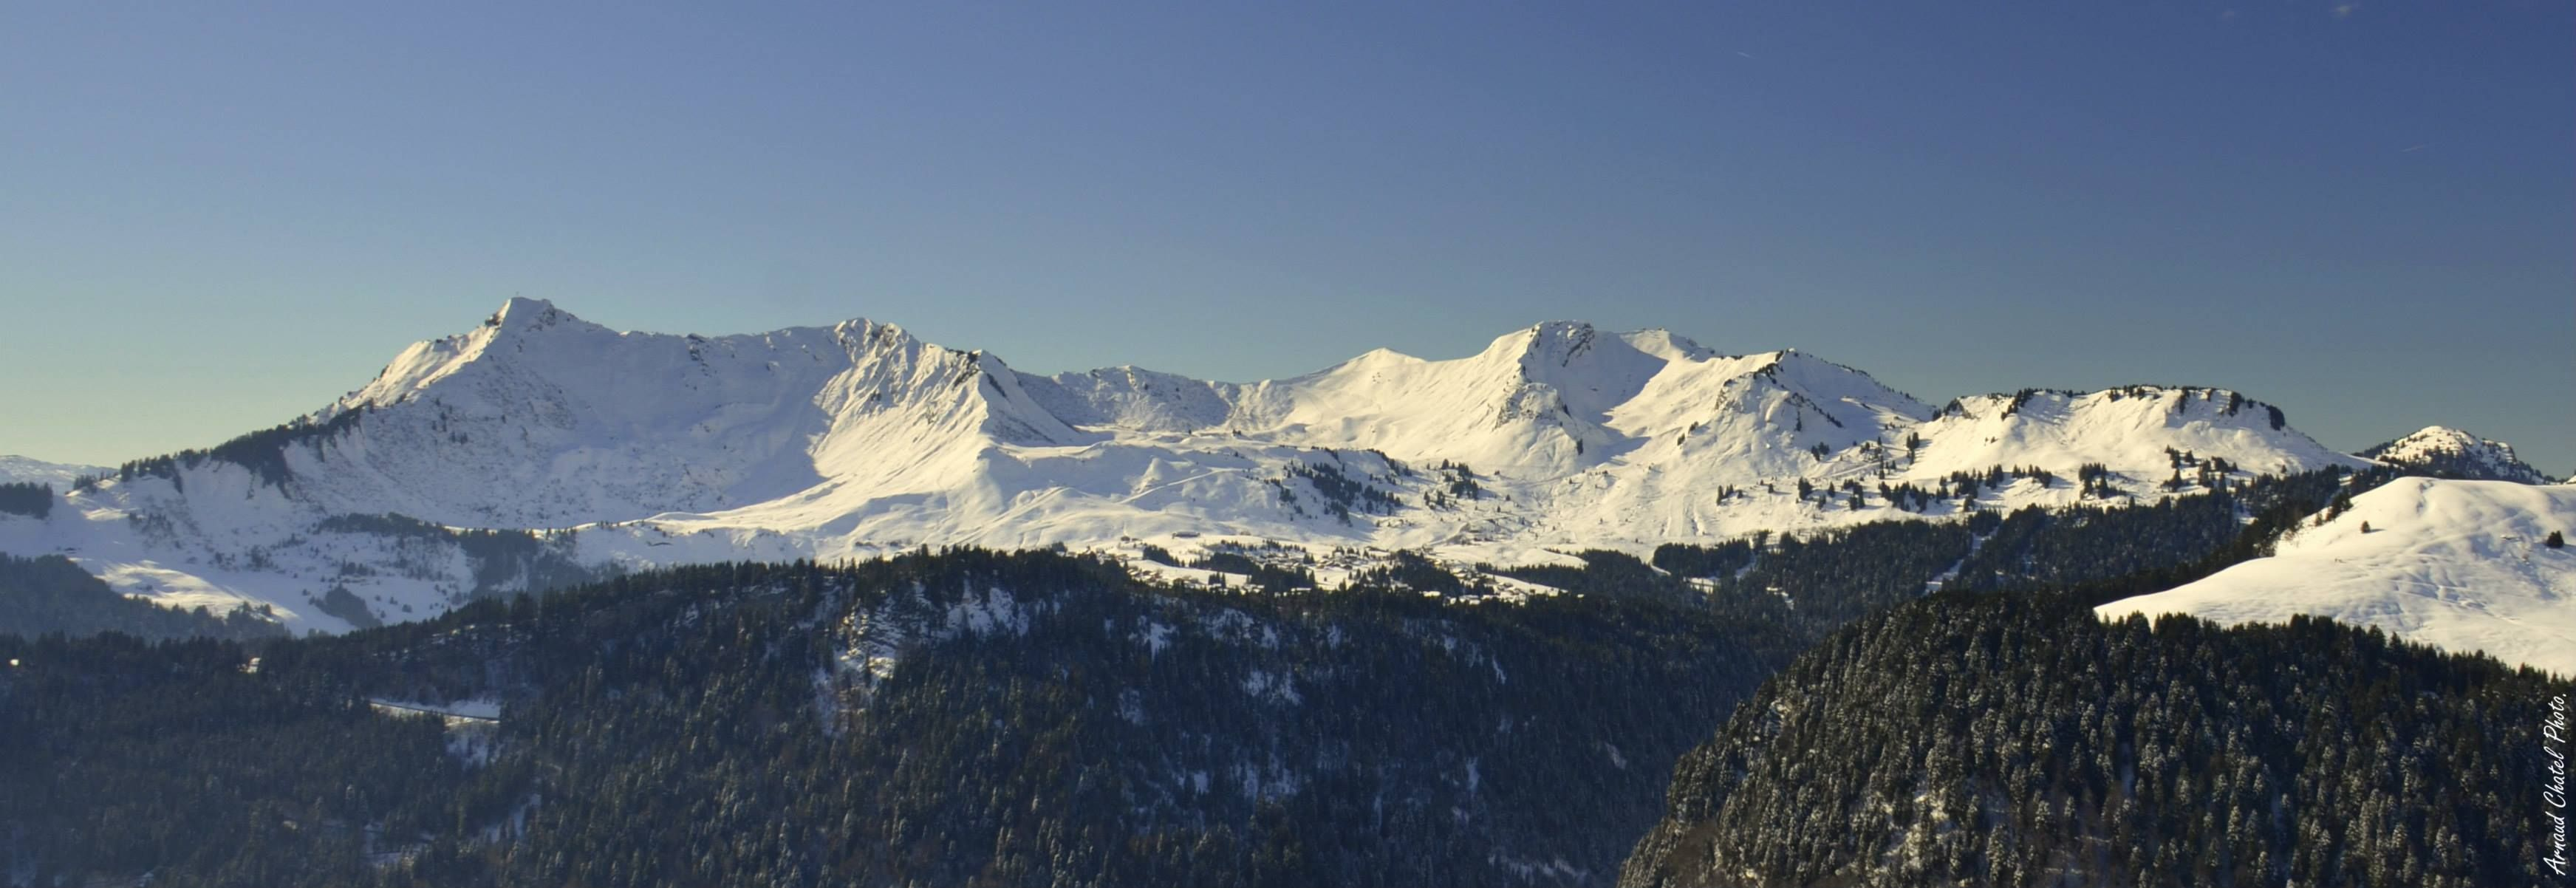 Photo From Patrick Alivertti Mieussy Montagnes Prazdelys Sommand Alps Savoie Nature Mountains Skiholidays Mountains Ski Holidays French Alps